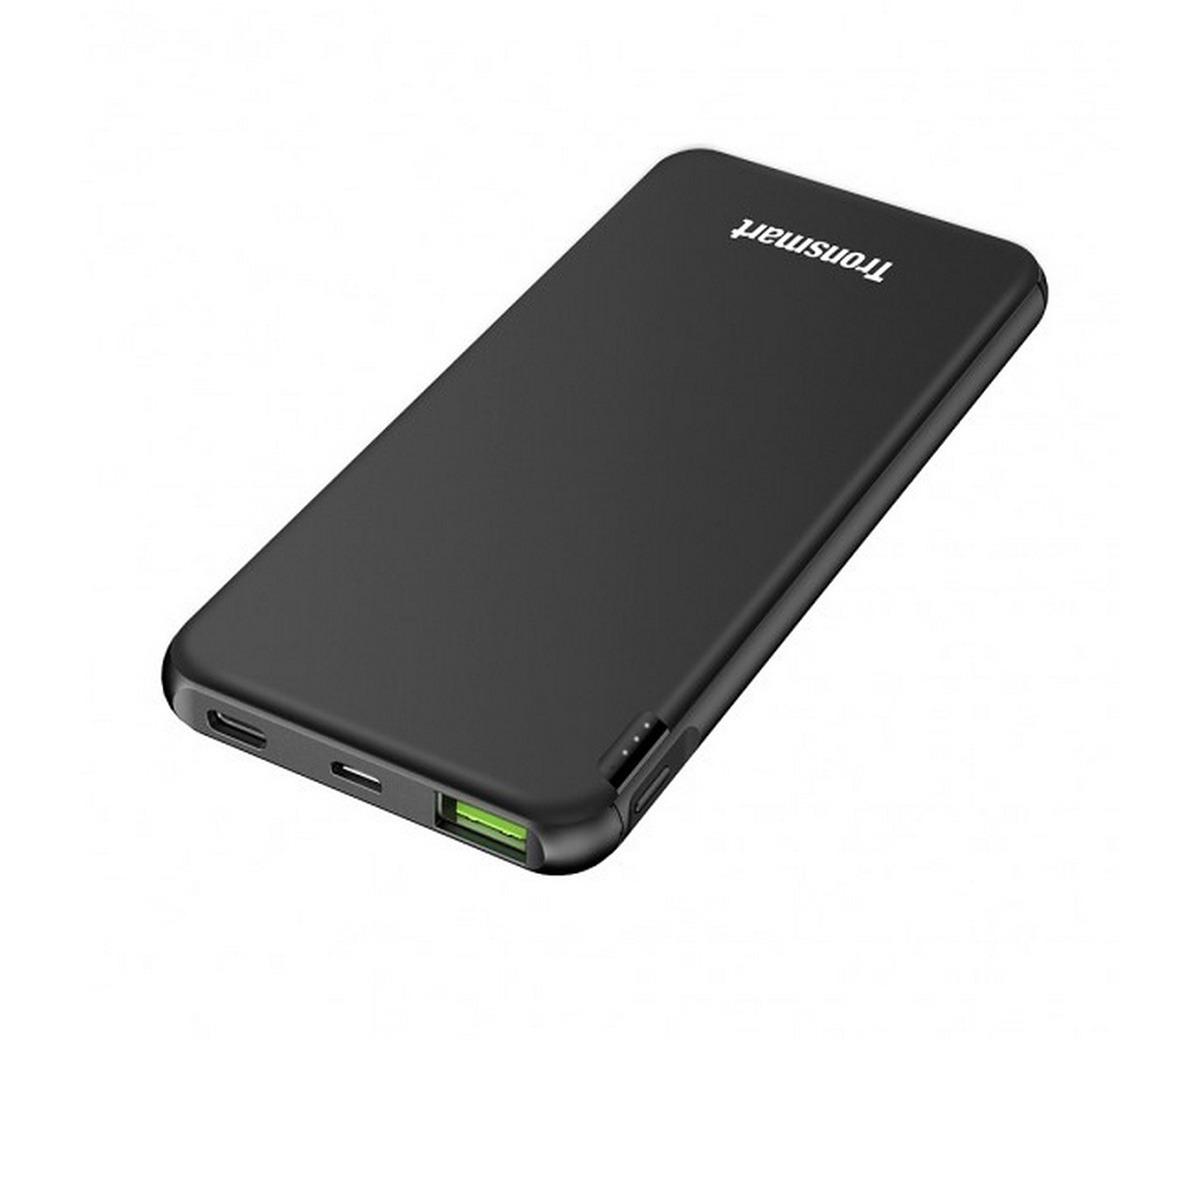 Tronsmart PBD02 10000mAh USB-C PD Power Bank